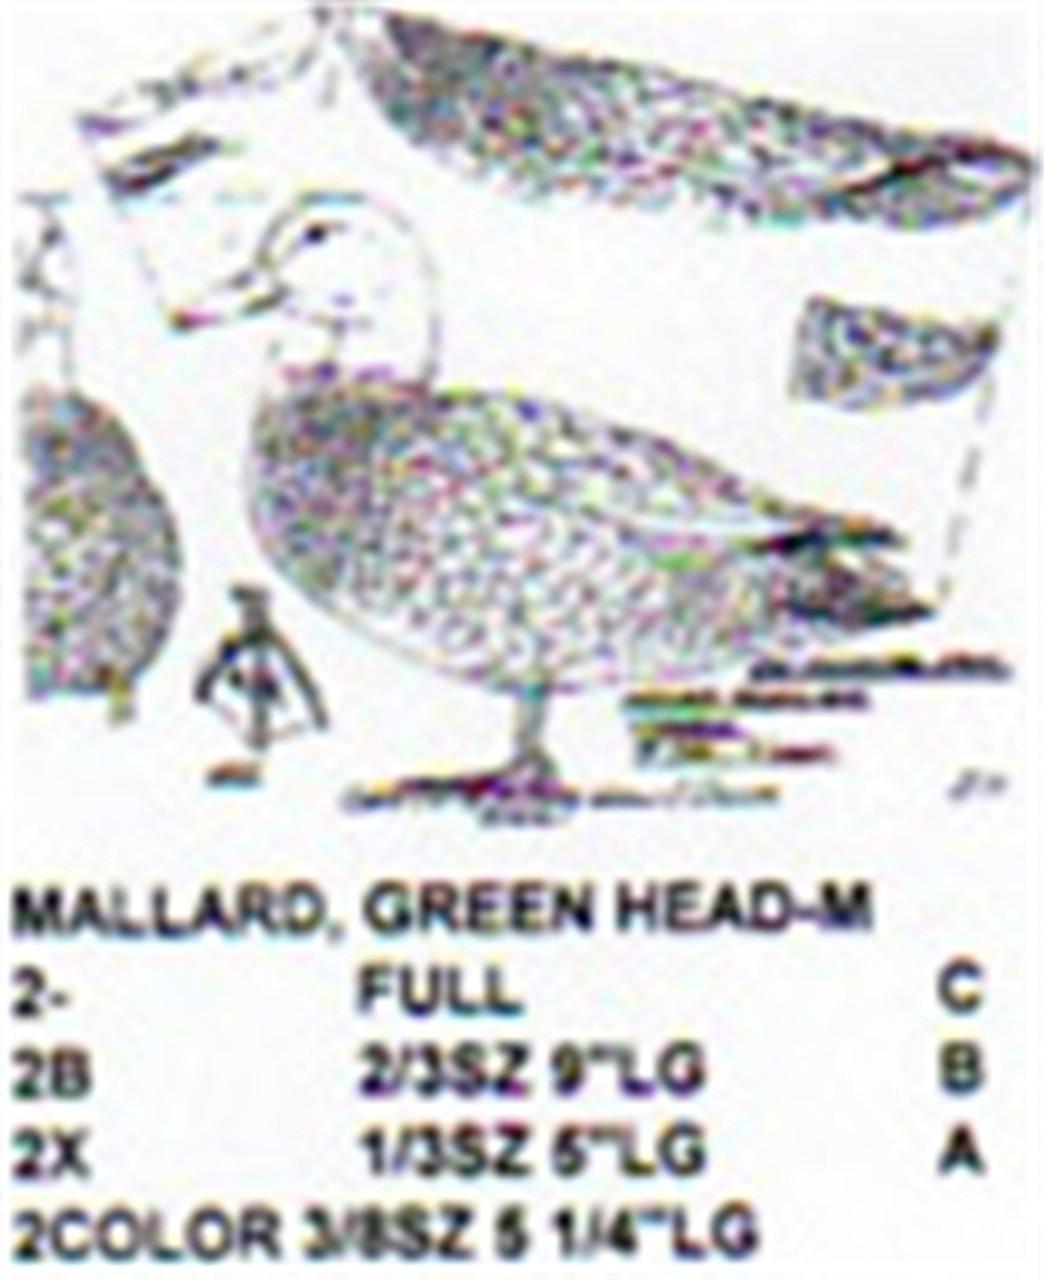 Green Head Mallard Male Standing Carving Pattern shows the full size  Green Head Male Mallard carving pattern.